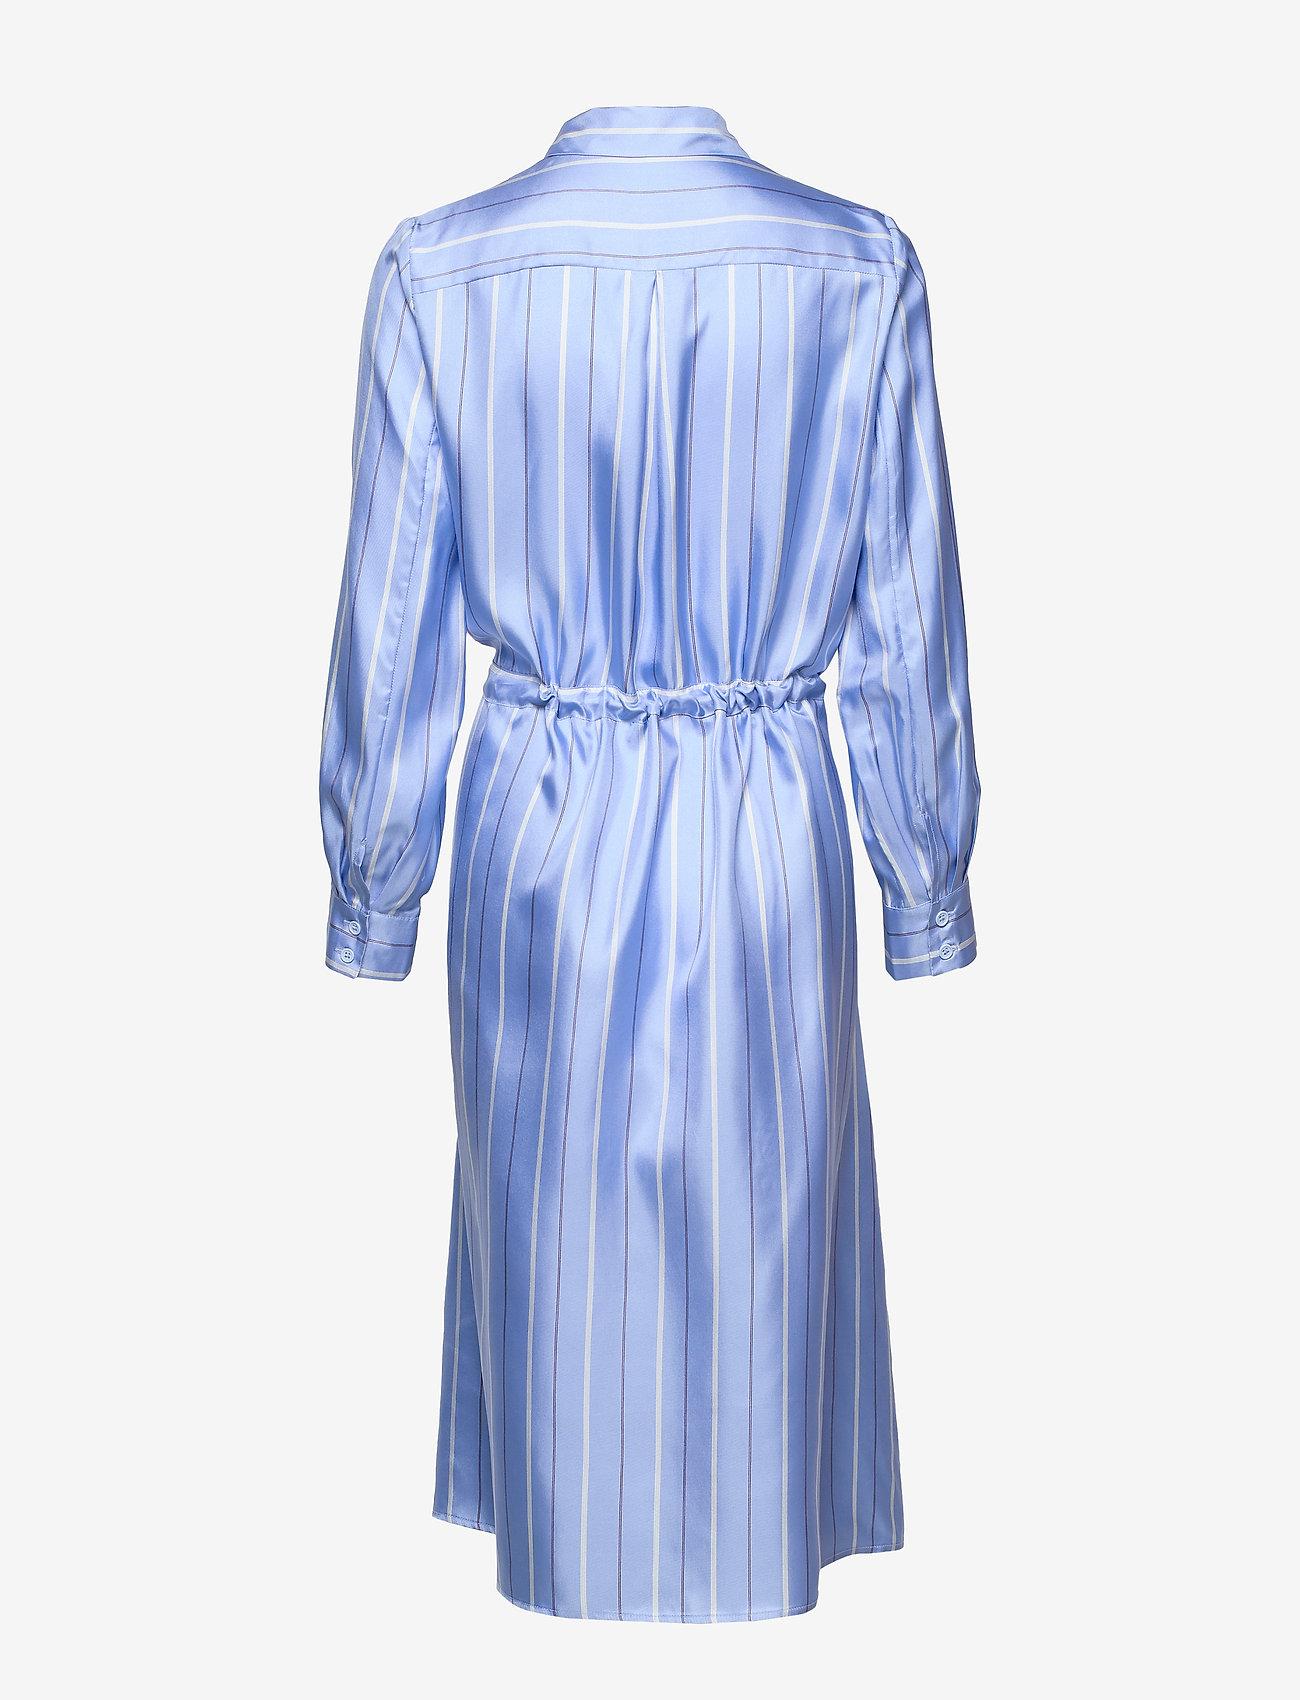 Frida Dress (Boy Blue) - Lovechild 1979 OyCPA0